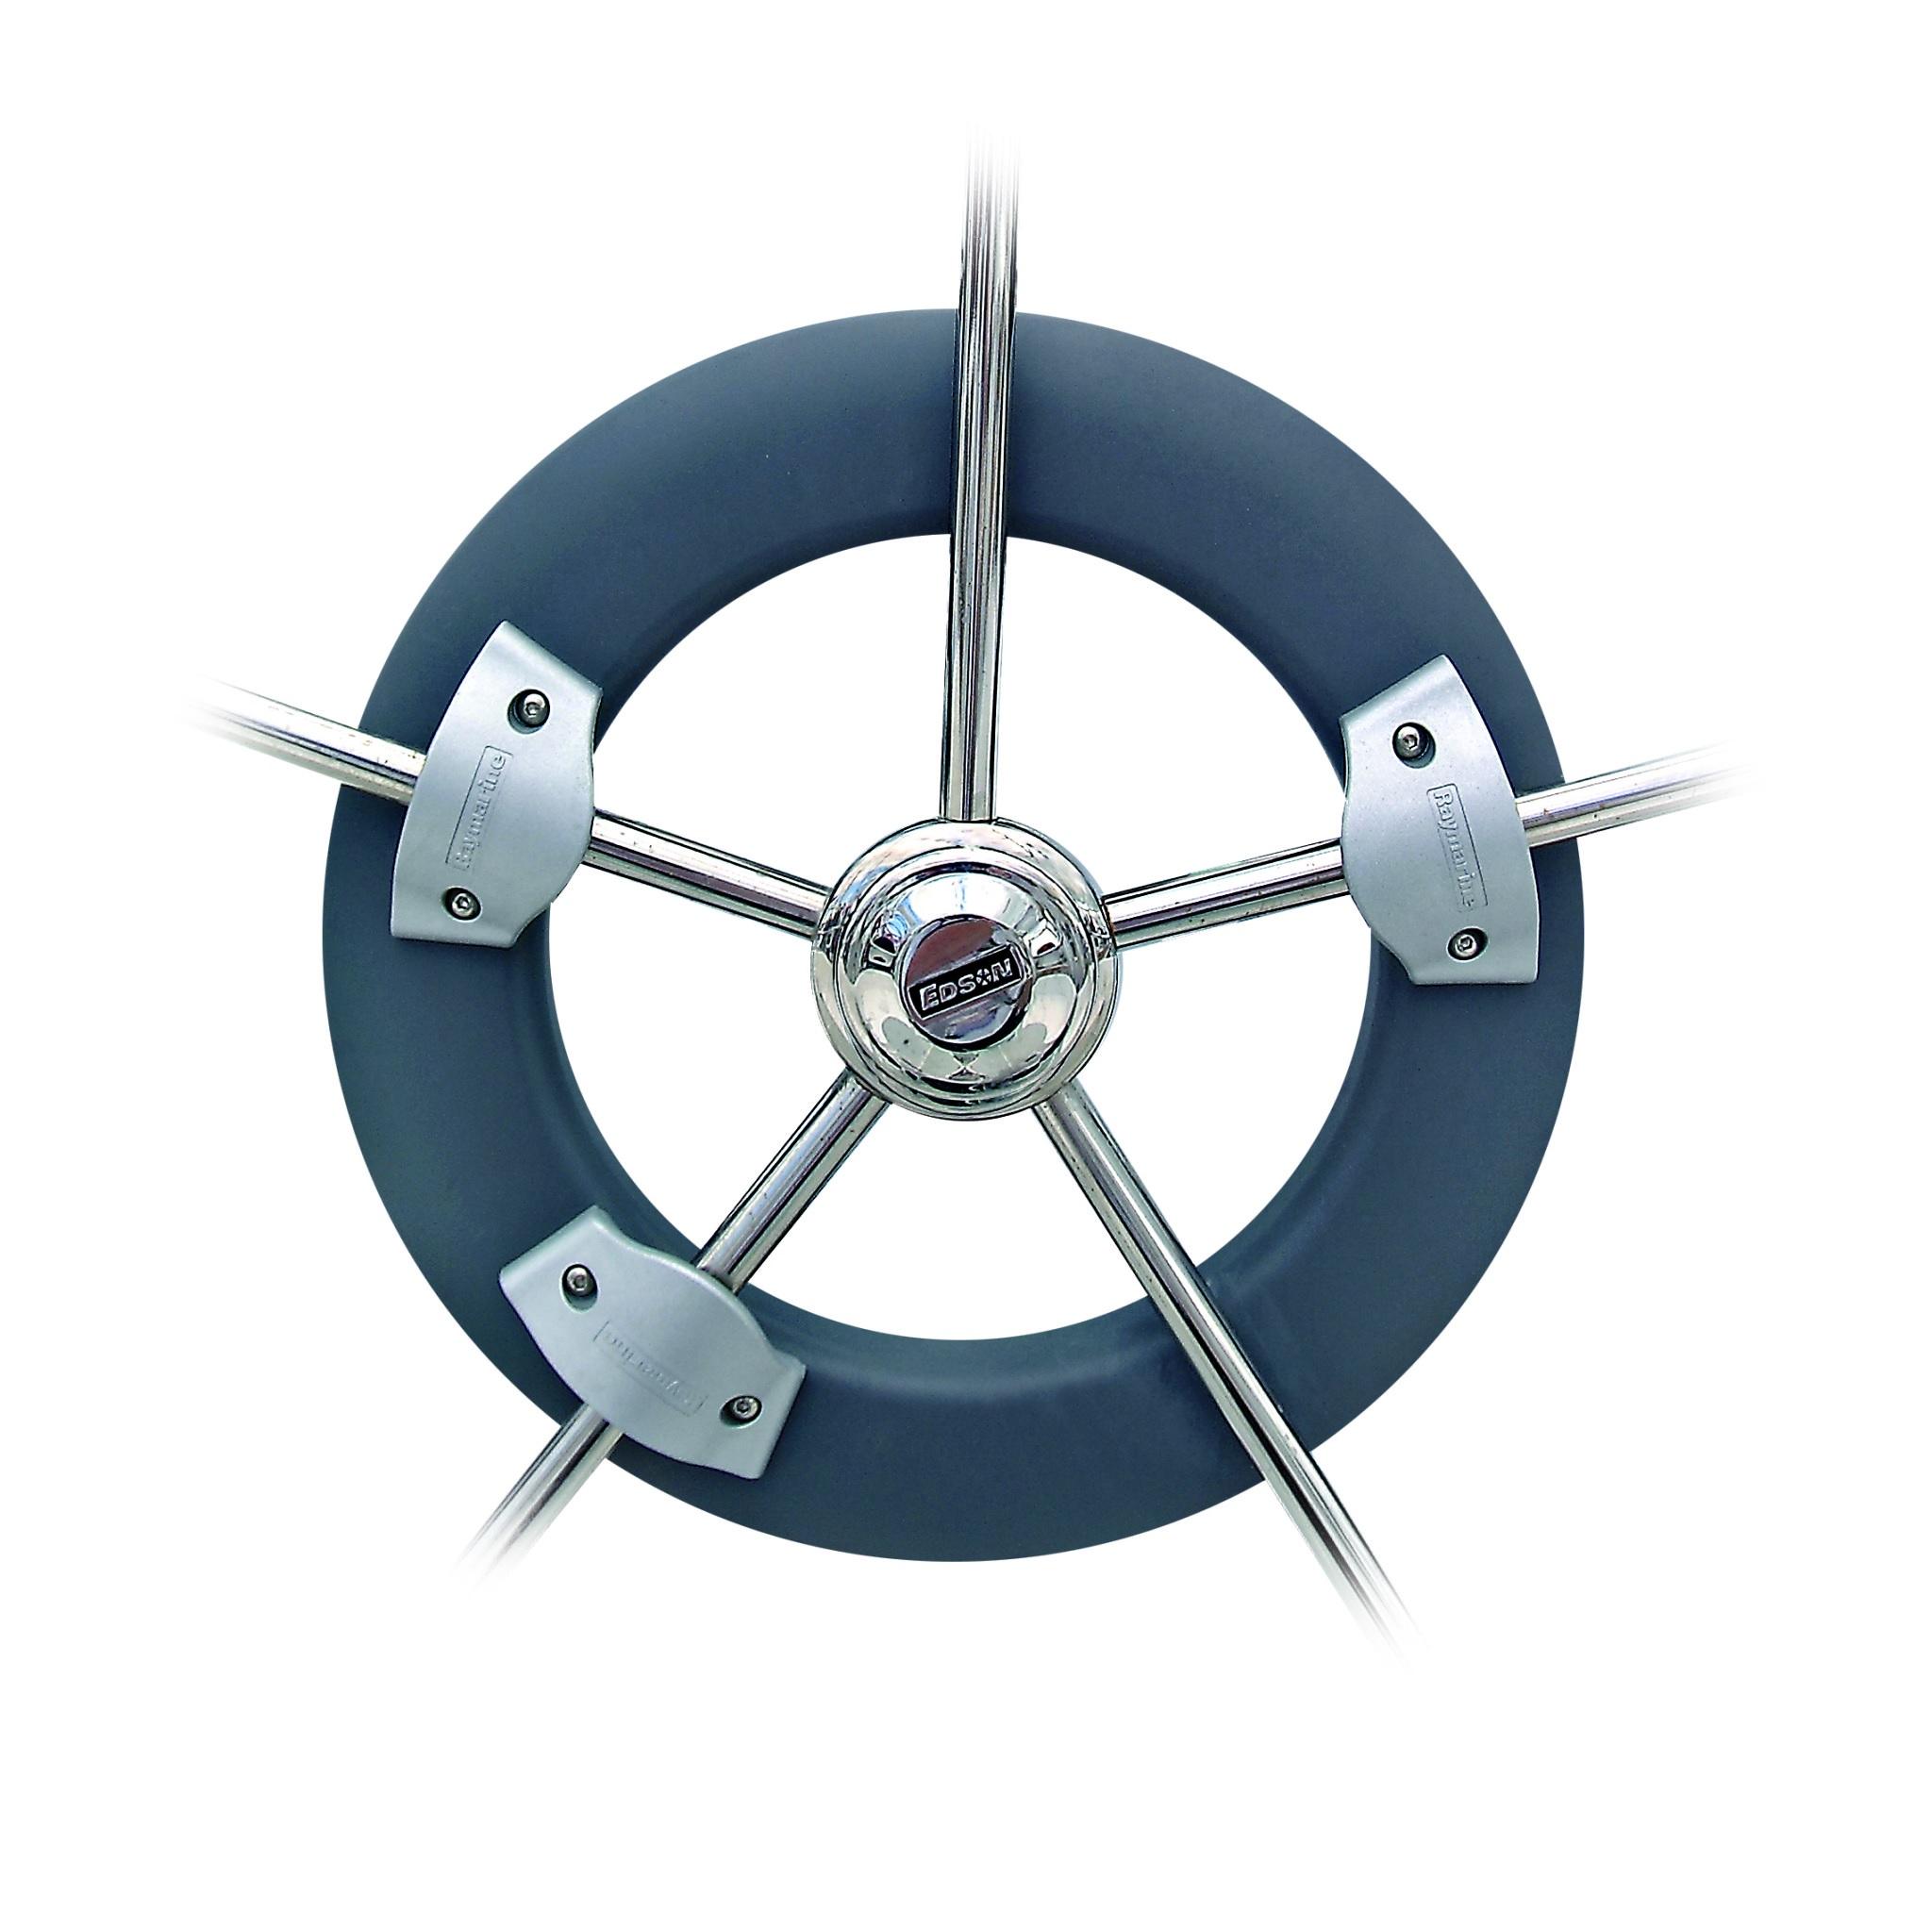 Raymarine Wheel Drive Unit For Sailboat - # E12093